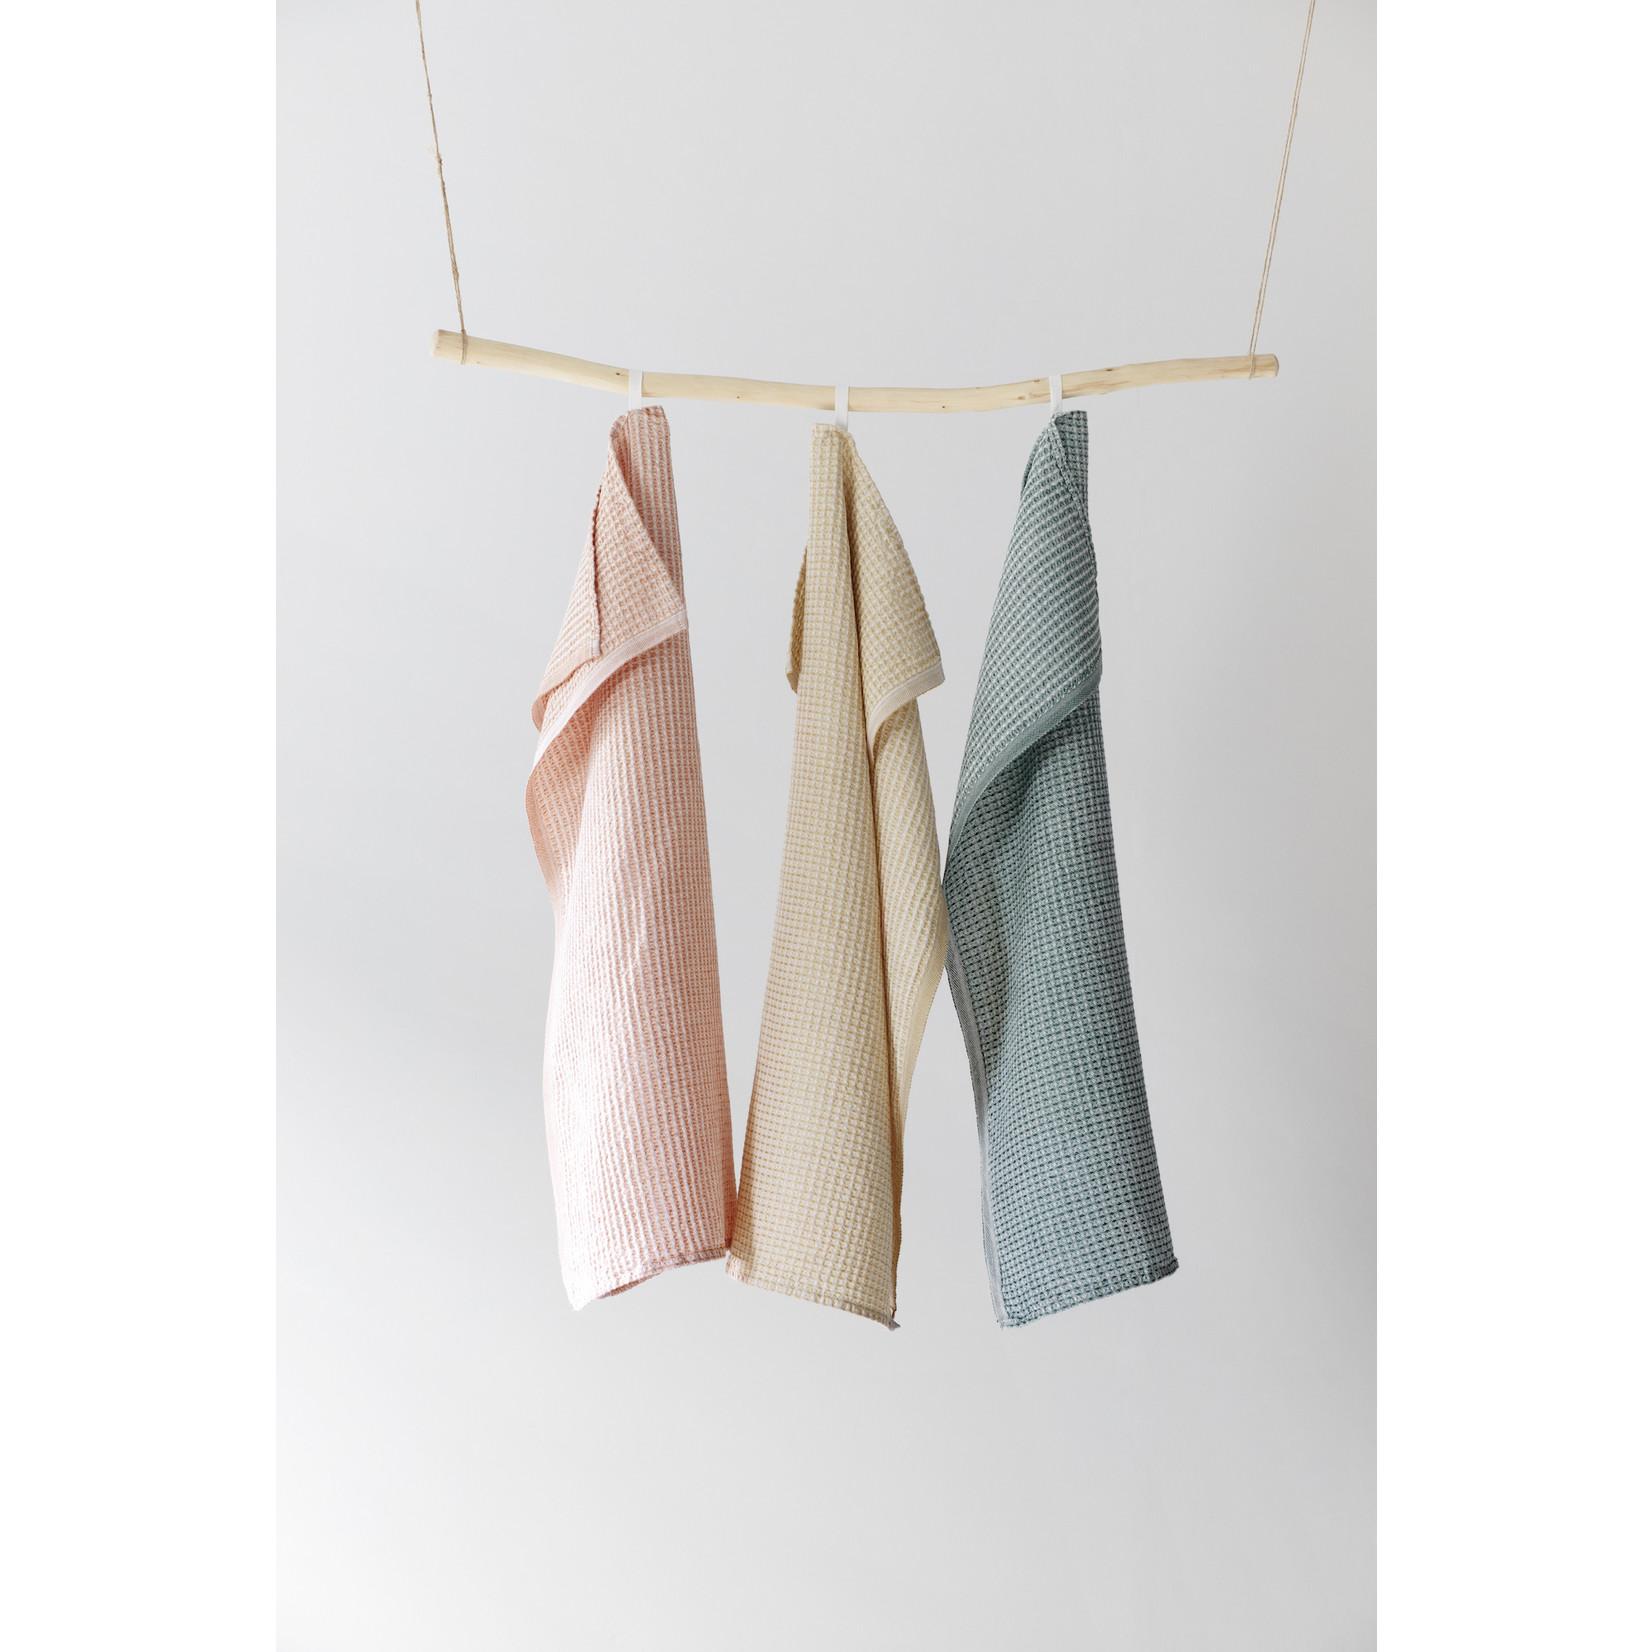 Lapuan Kankurit MAIJA keukenhanddoek - linnen, tencel & katoen - 5 kleuren